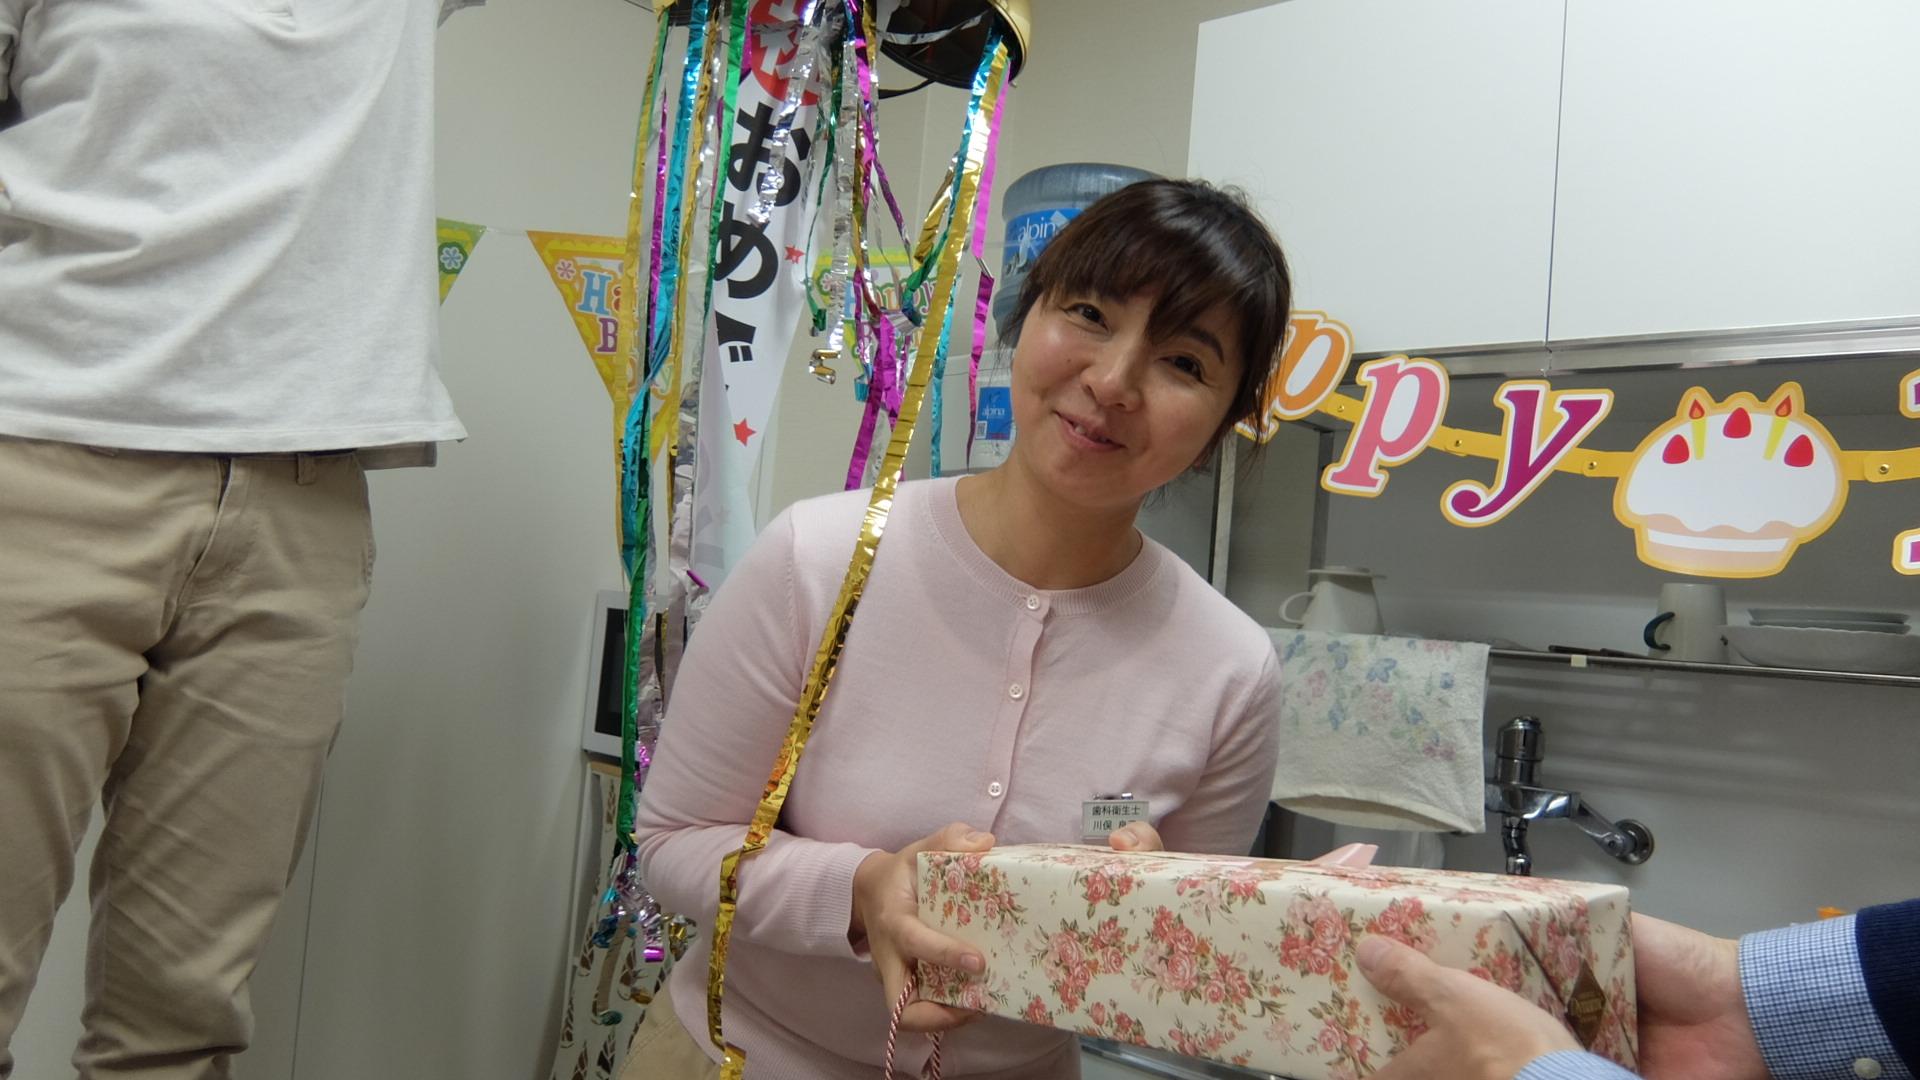 http://www.kunitachi-kodomo.com/blog/staff/images/DSCF6438.JPG